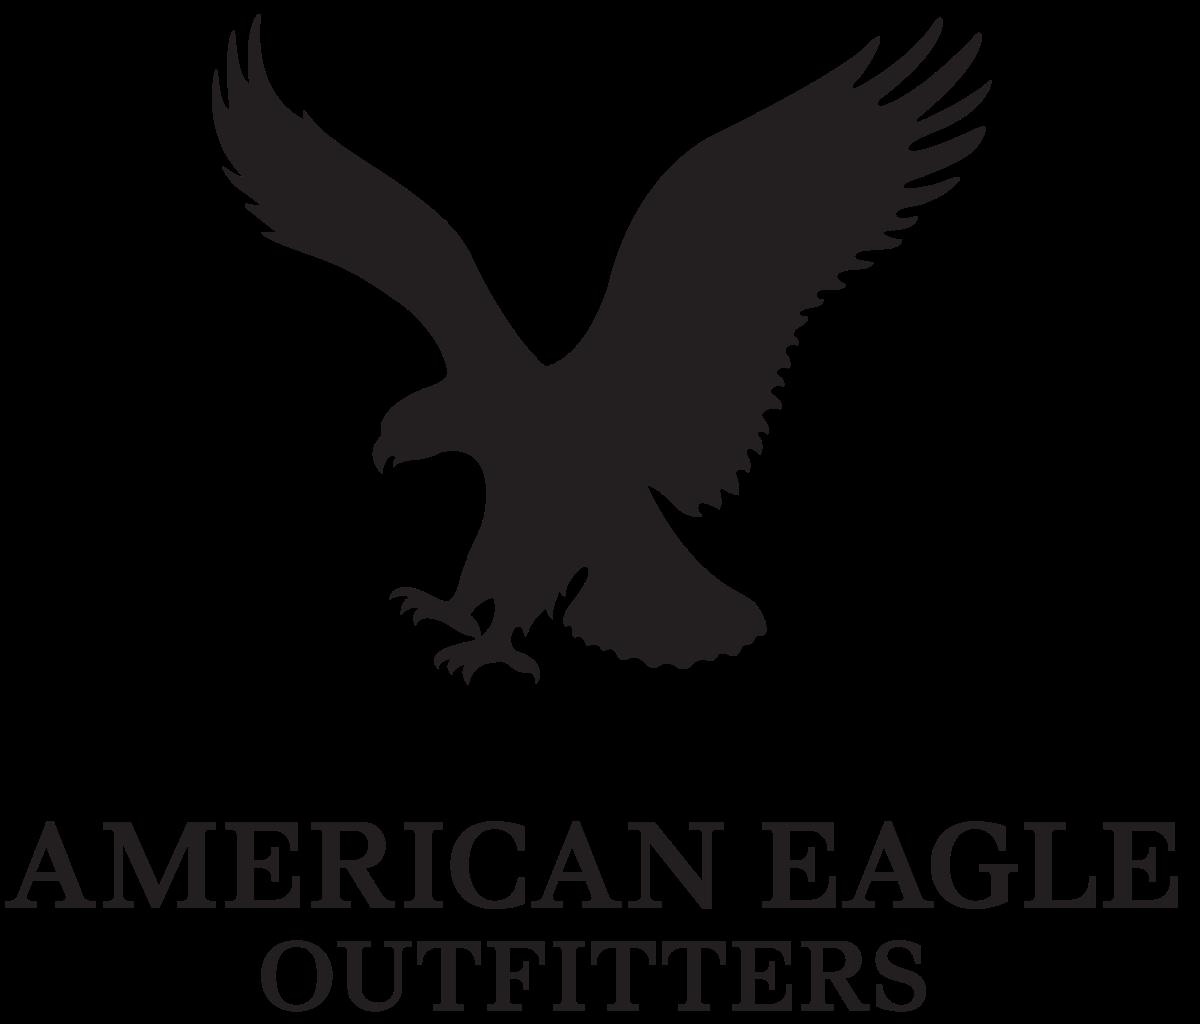 american eagle logo.png